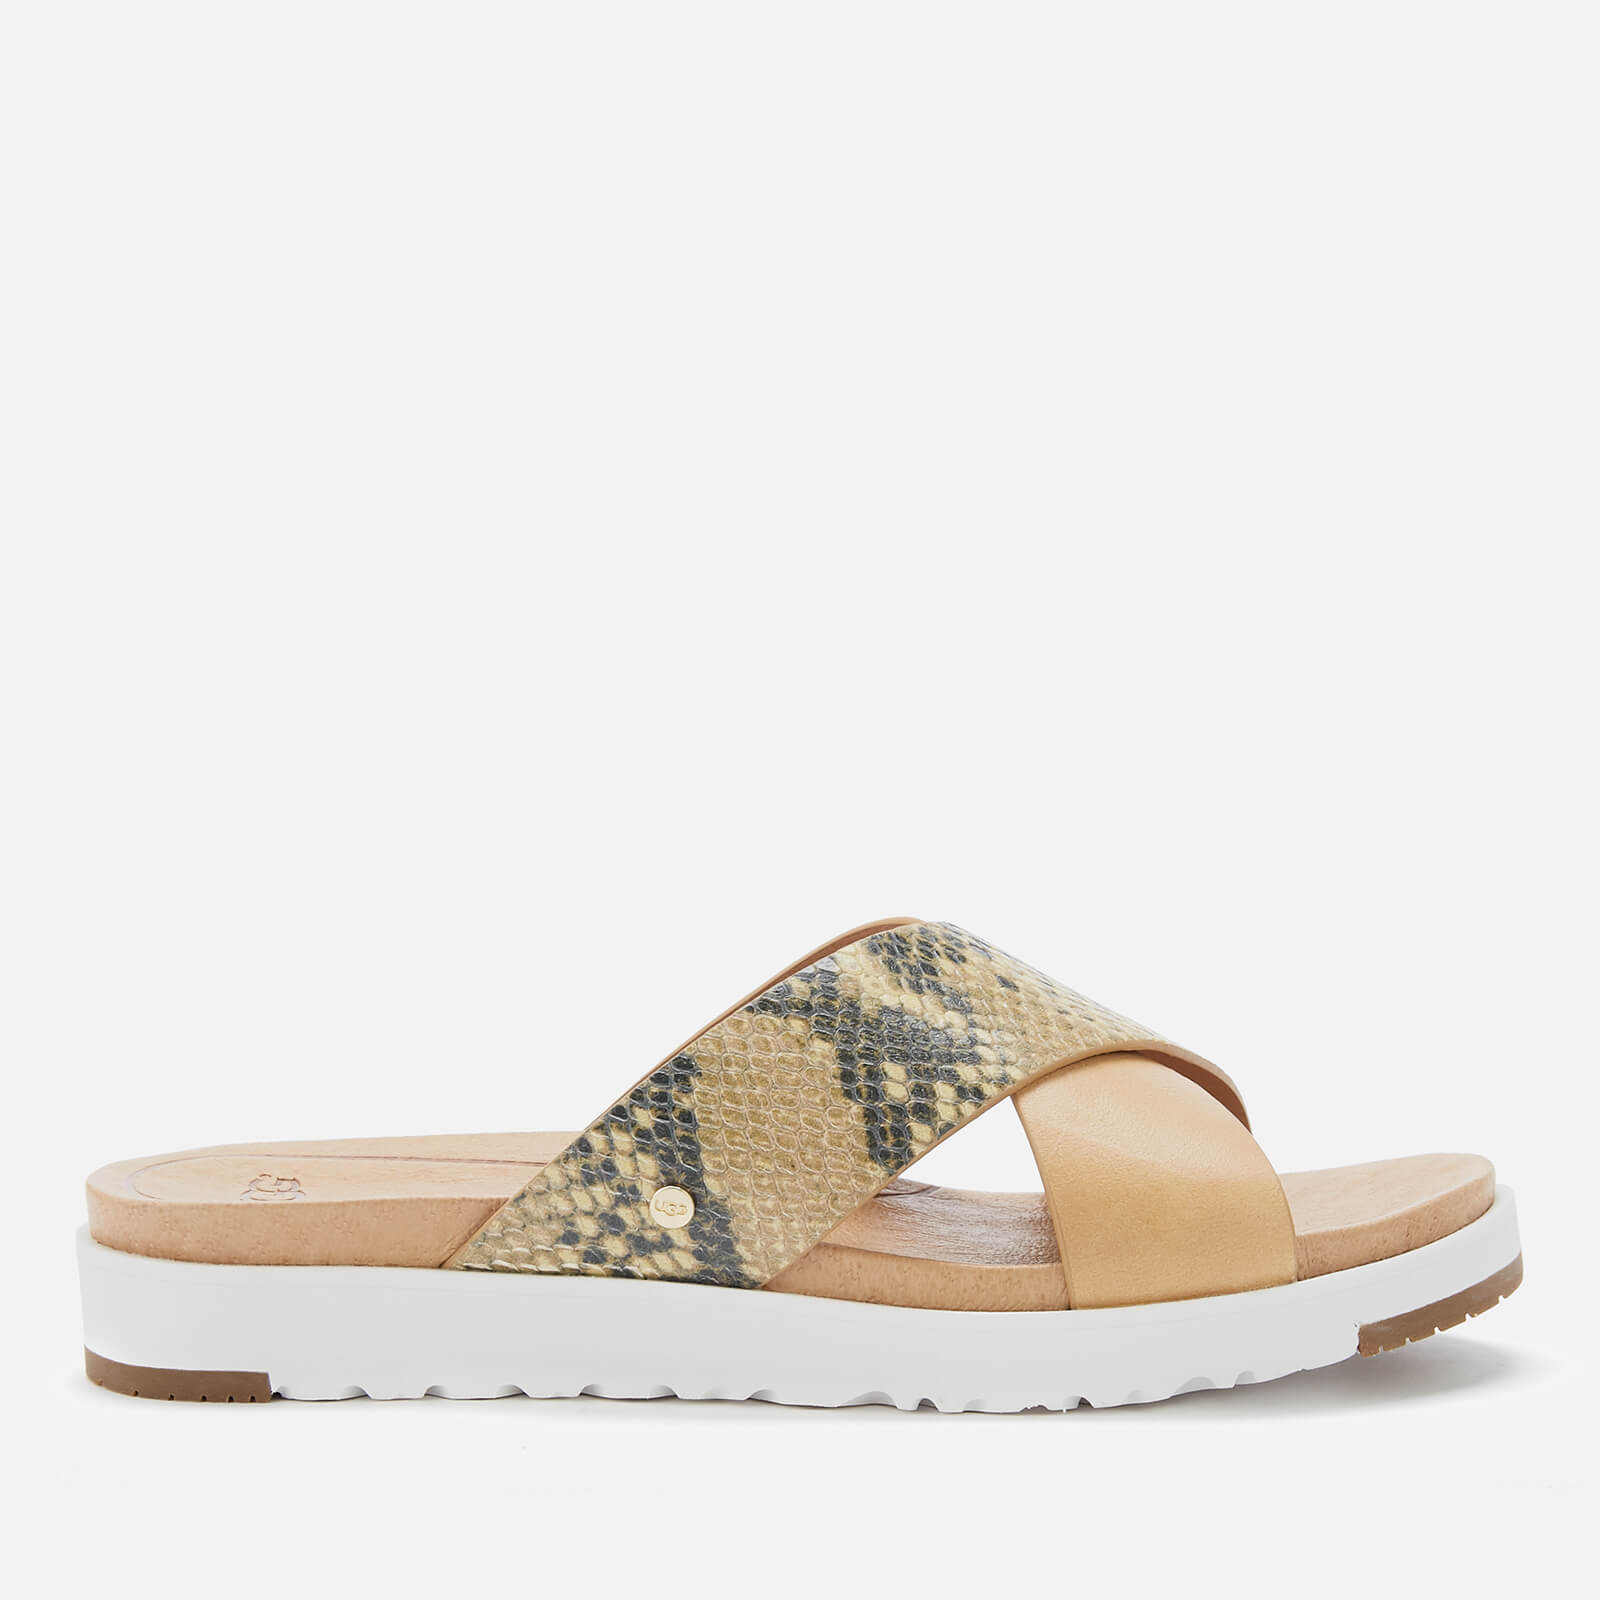 25b787a08bd UGG Women's Kari Exotic Cross Strap Slide Sandals - Tan